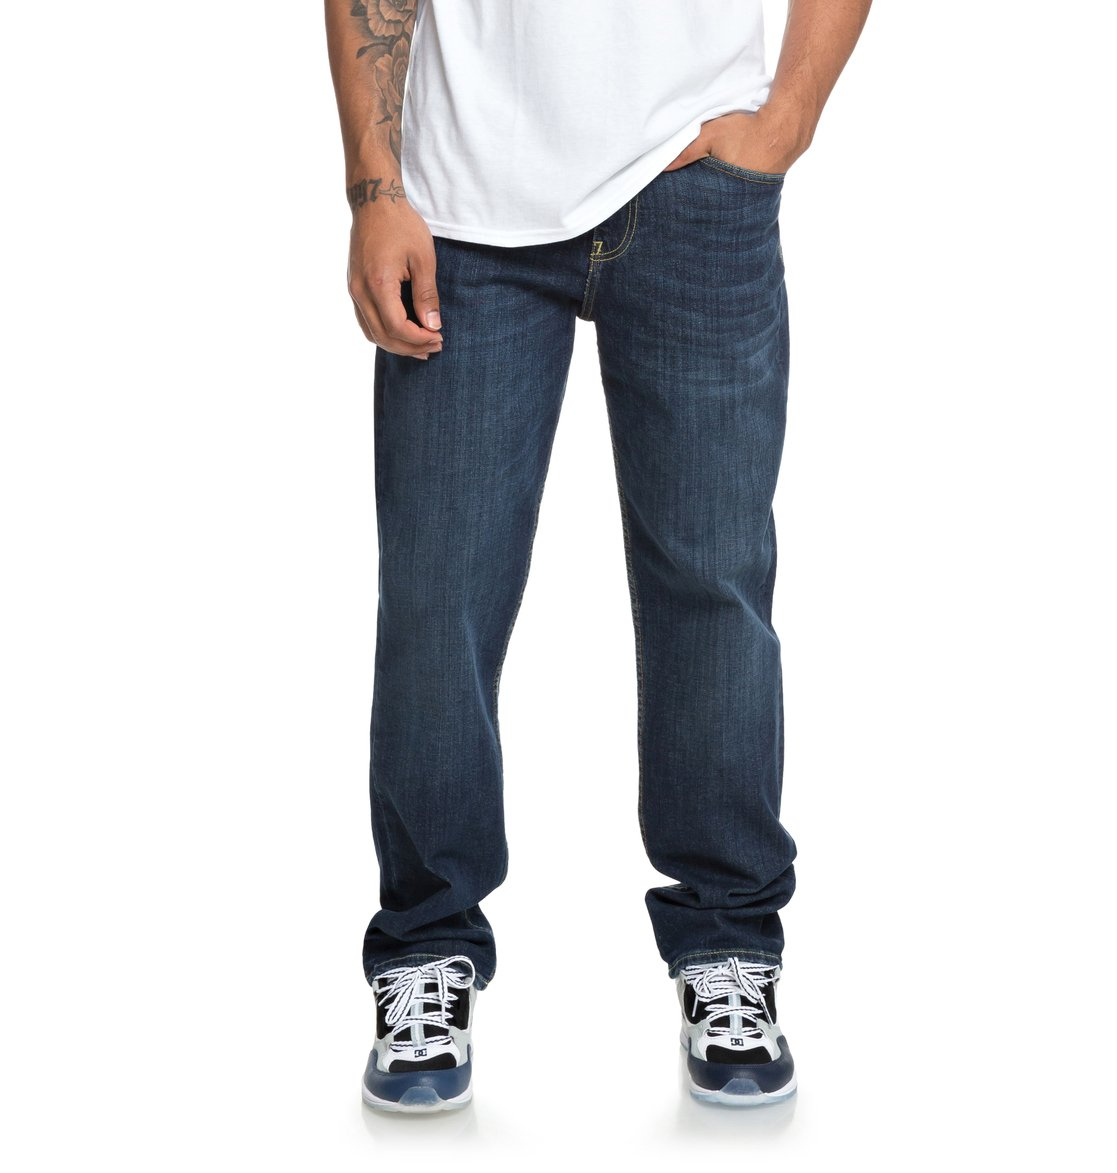 Medium DC Azul 0 Hombre Shoes corte de Worker relajado Stone EDYDP03381 Vaqueros para OPq6z5Pwn